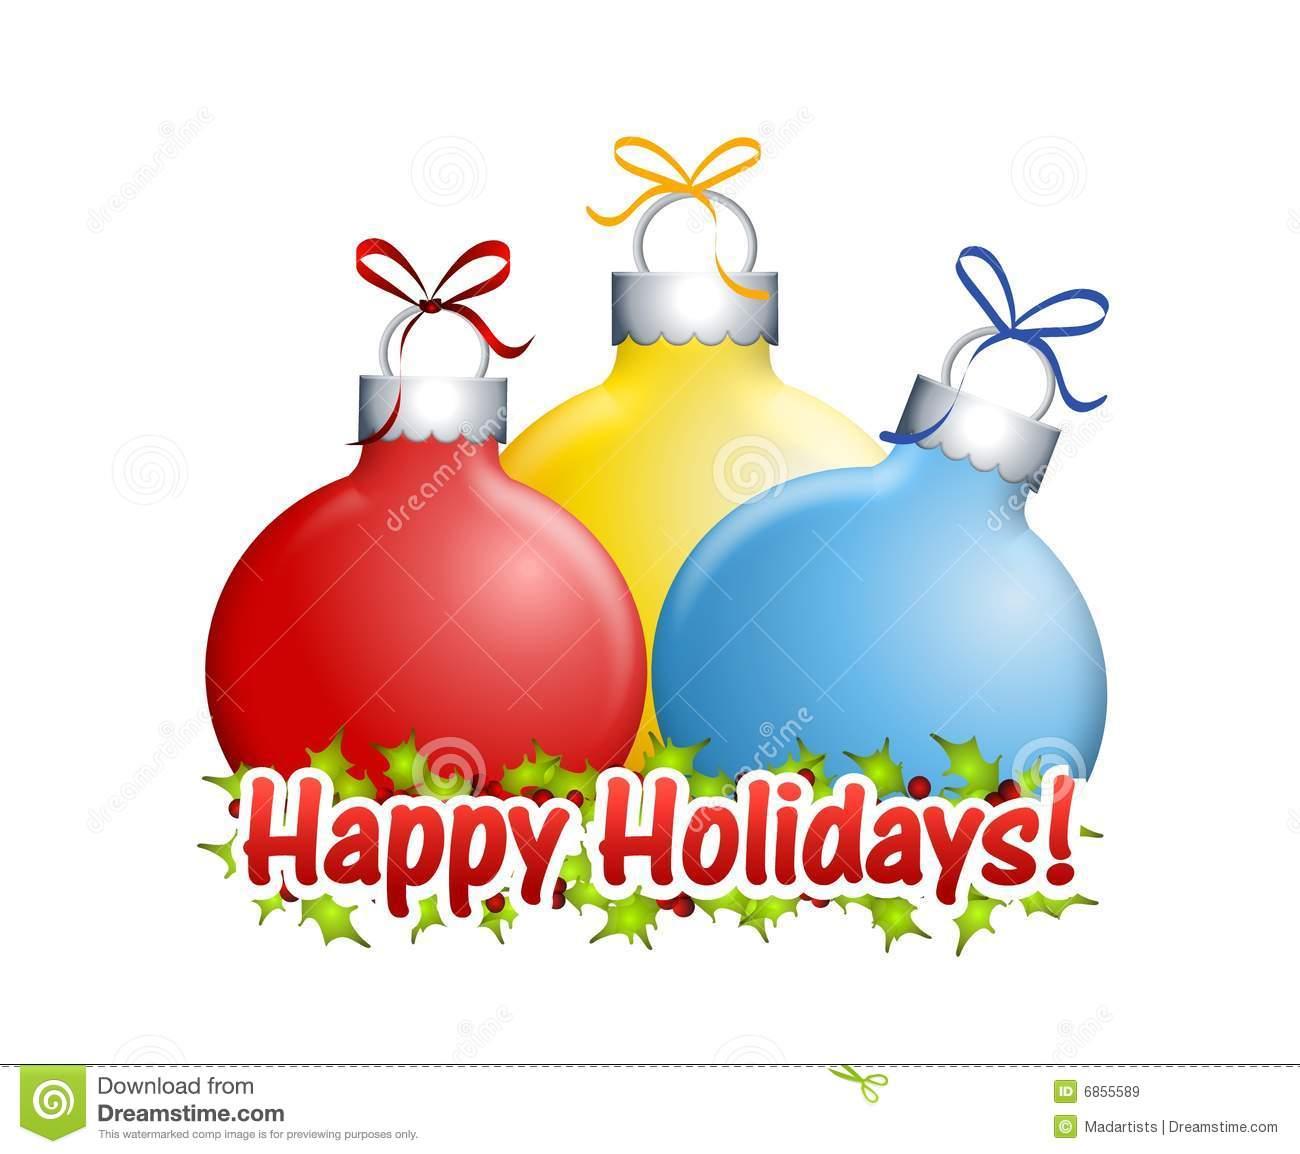 Happy Holidays Ornaments stock illustration. Illustration of image.